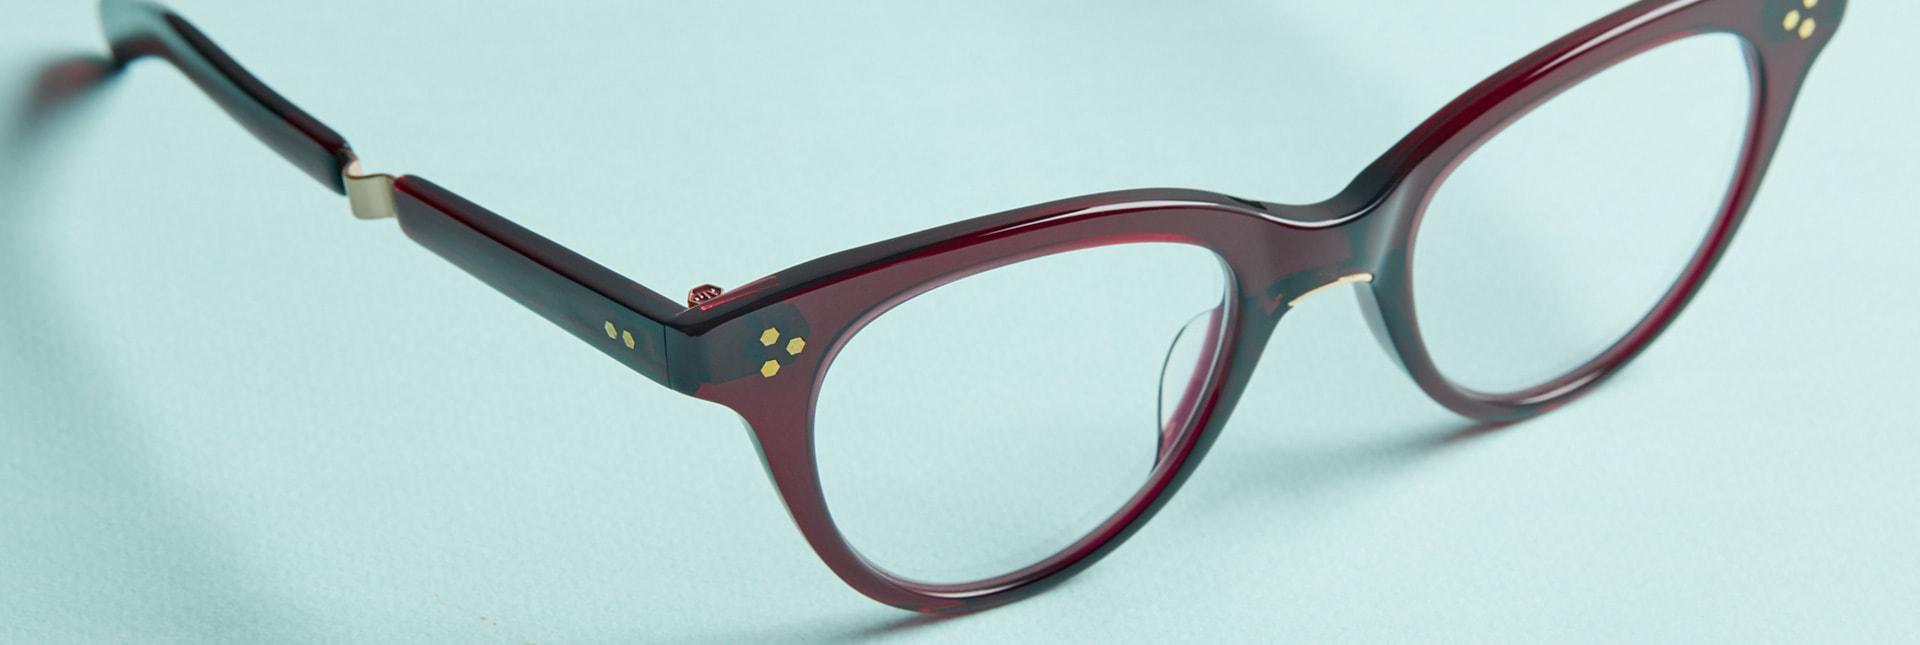 Mr. Leight® Eyeglasses